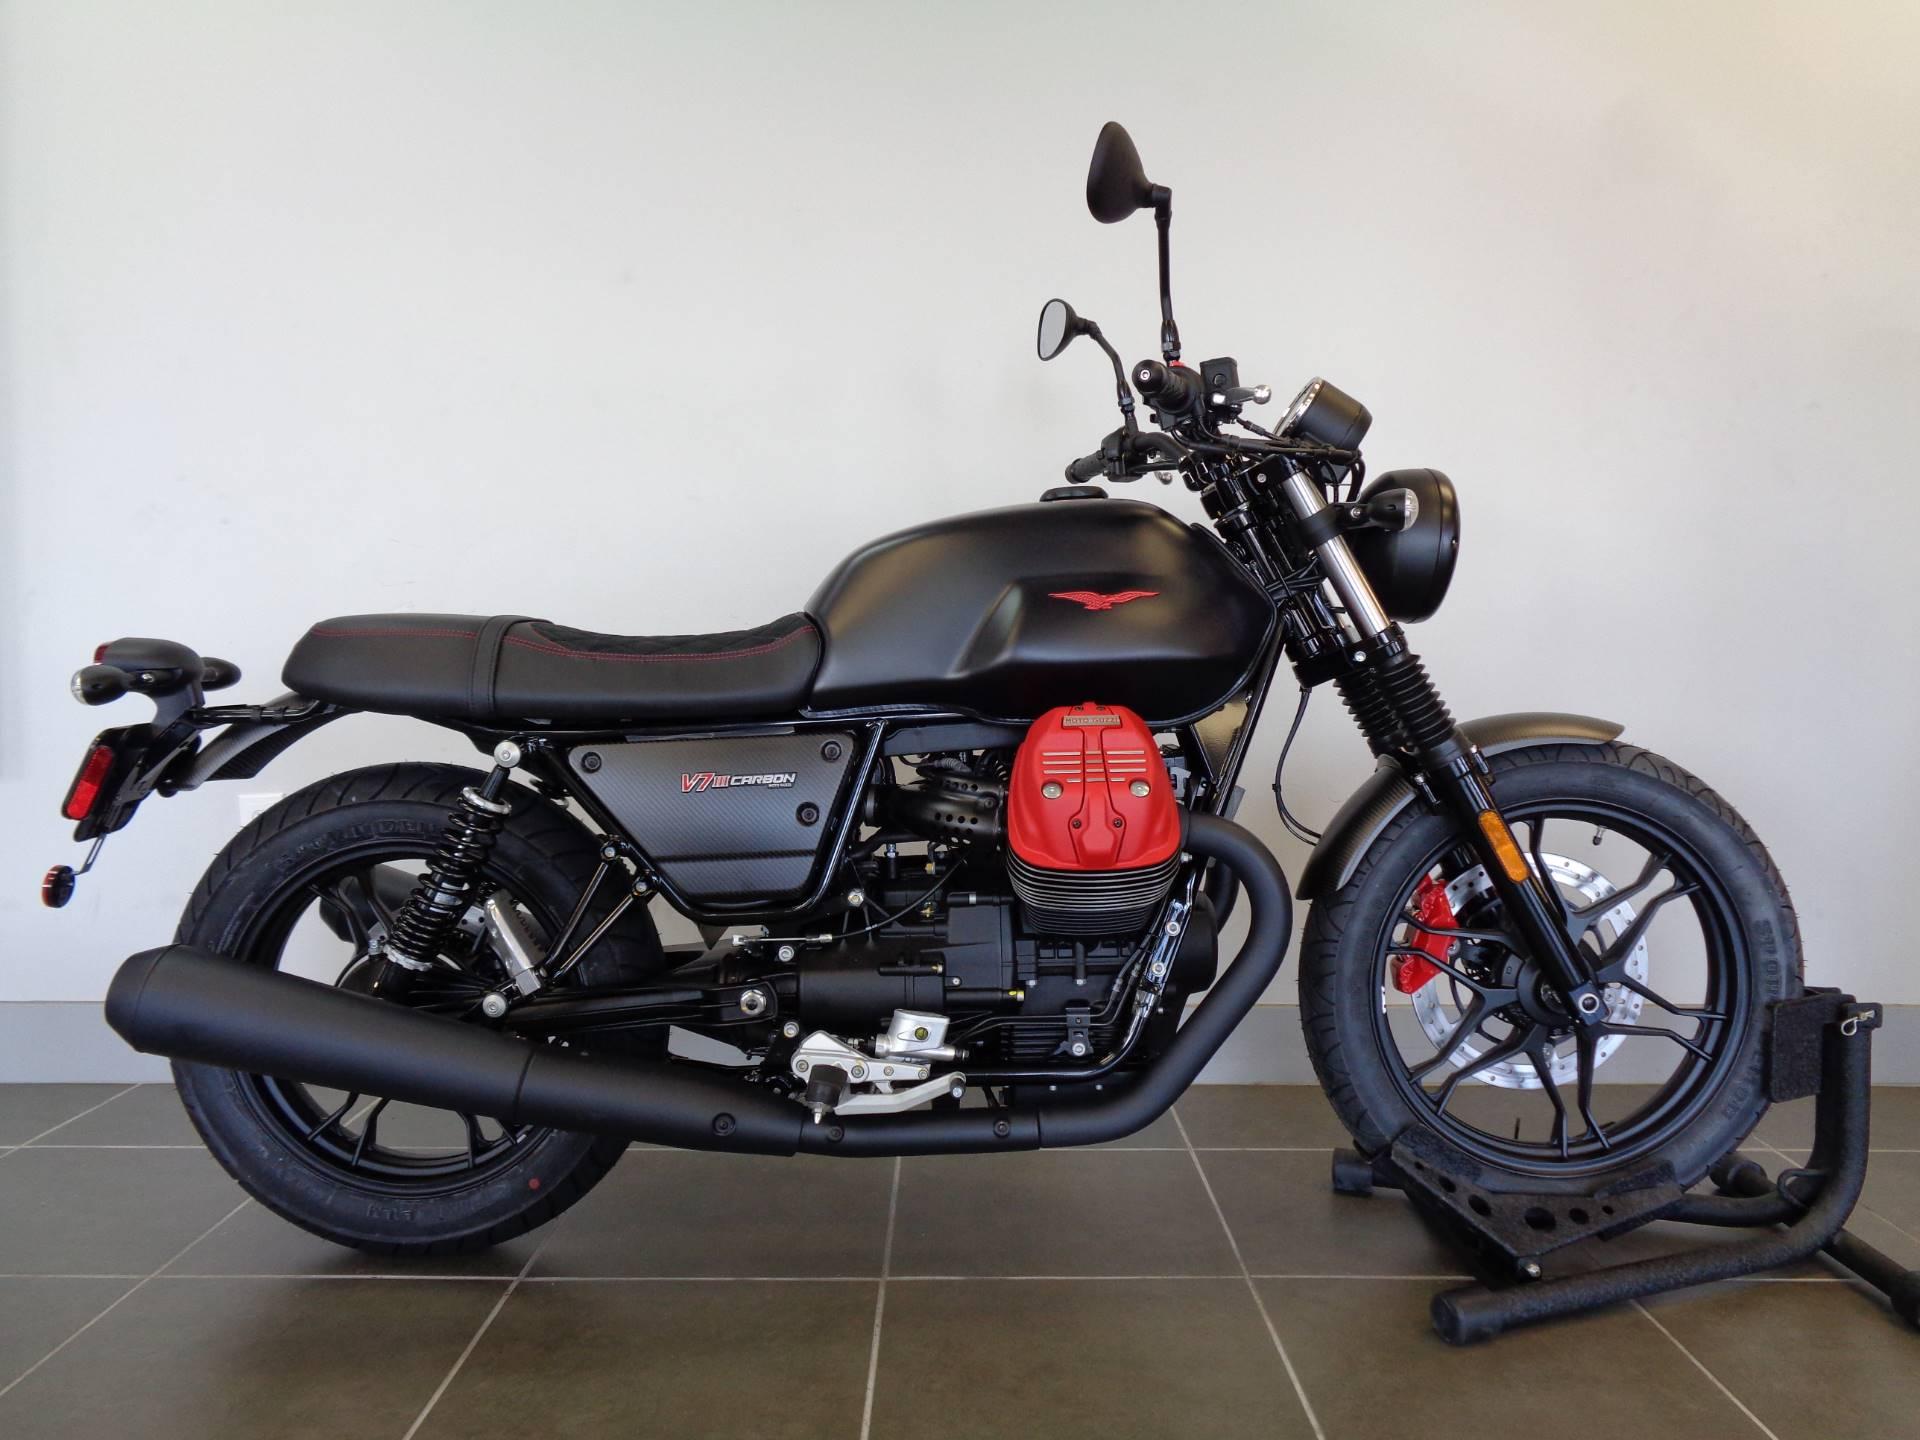 2018 Moto Guzzi V7 III Carbon Dark 1